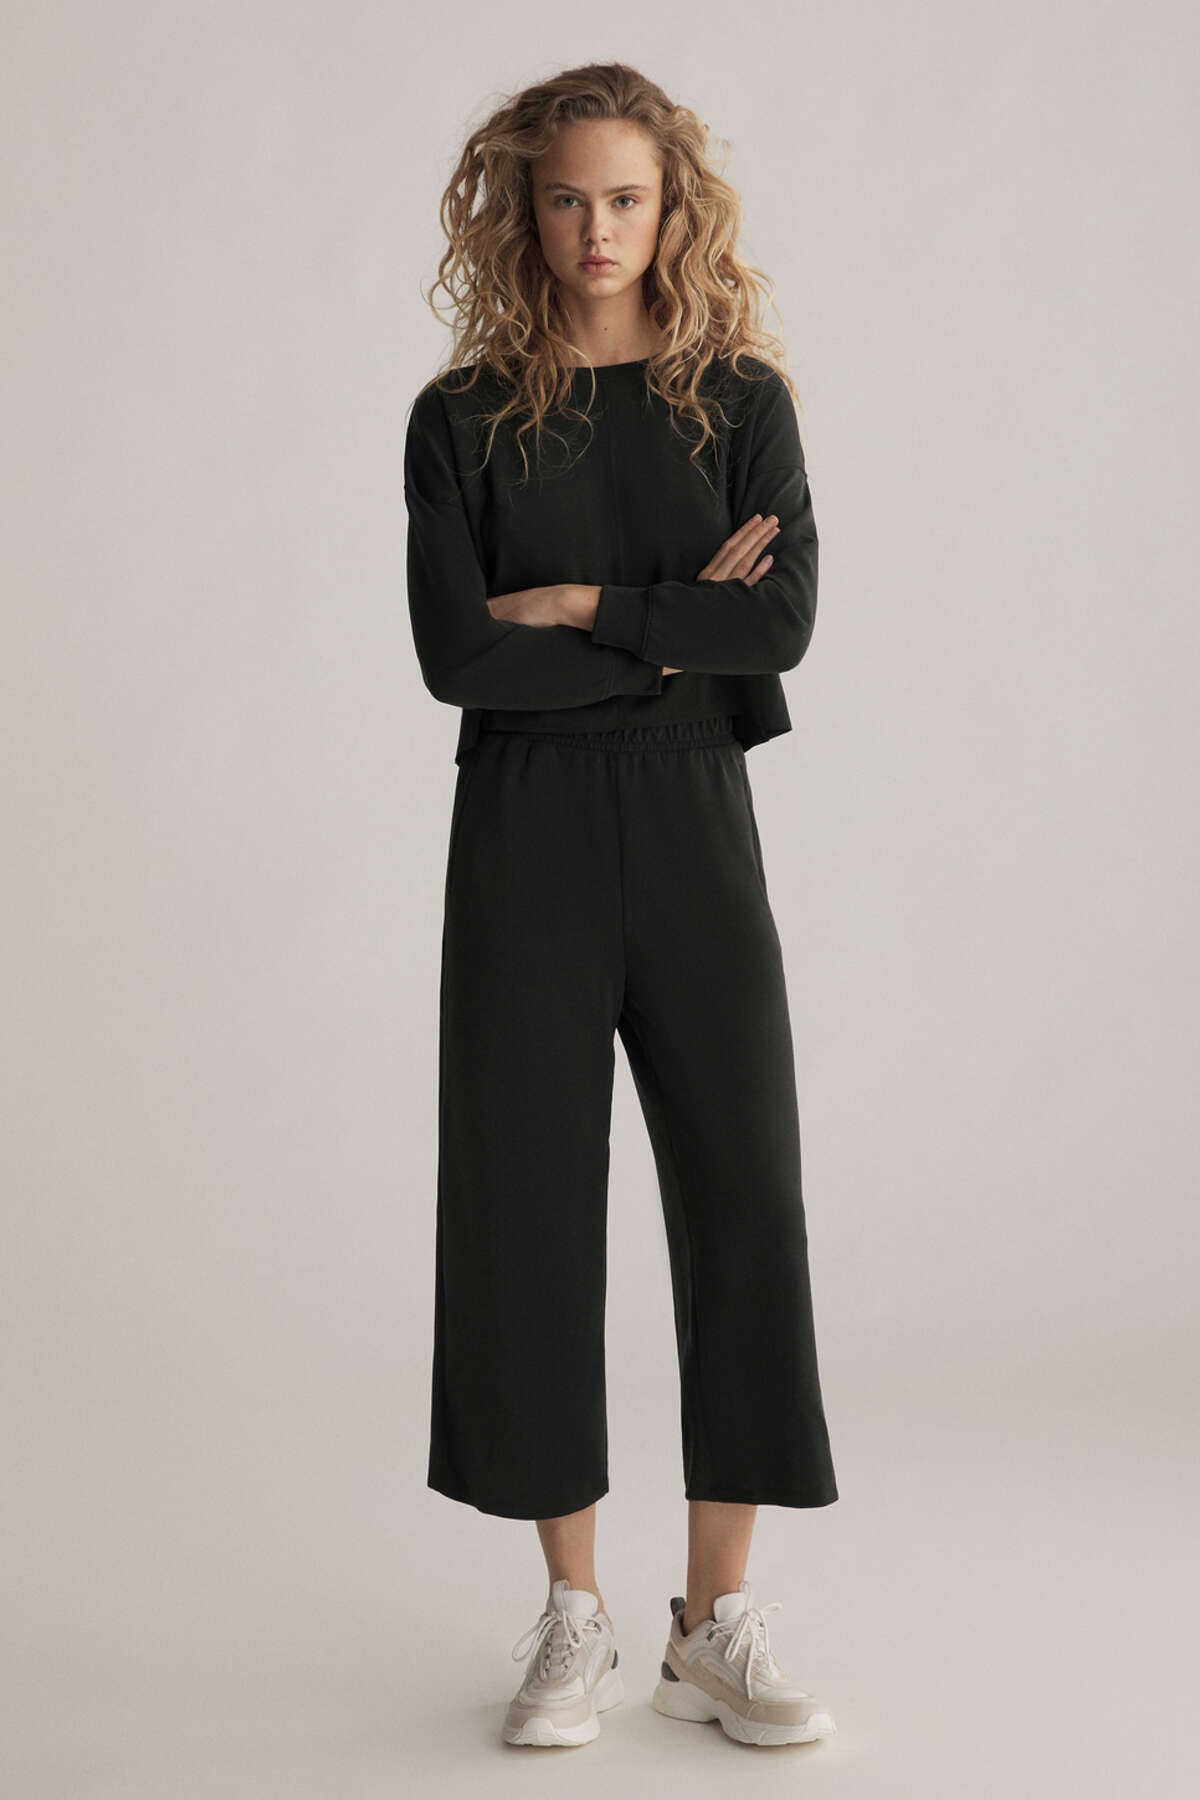 Oysho Kadın Modal Culotte Pantolon Siyah 31237666 2